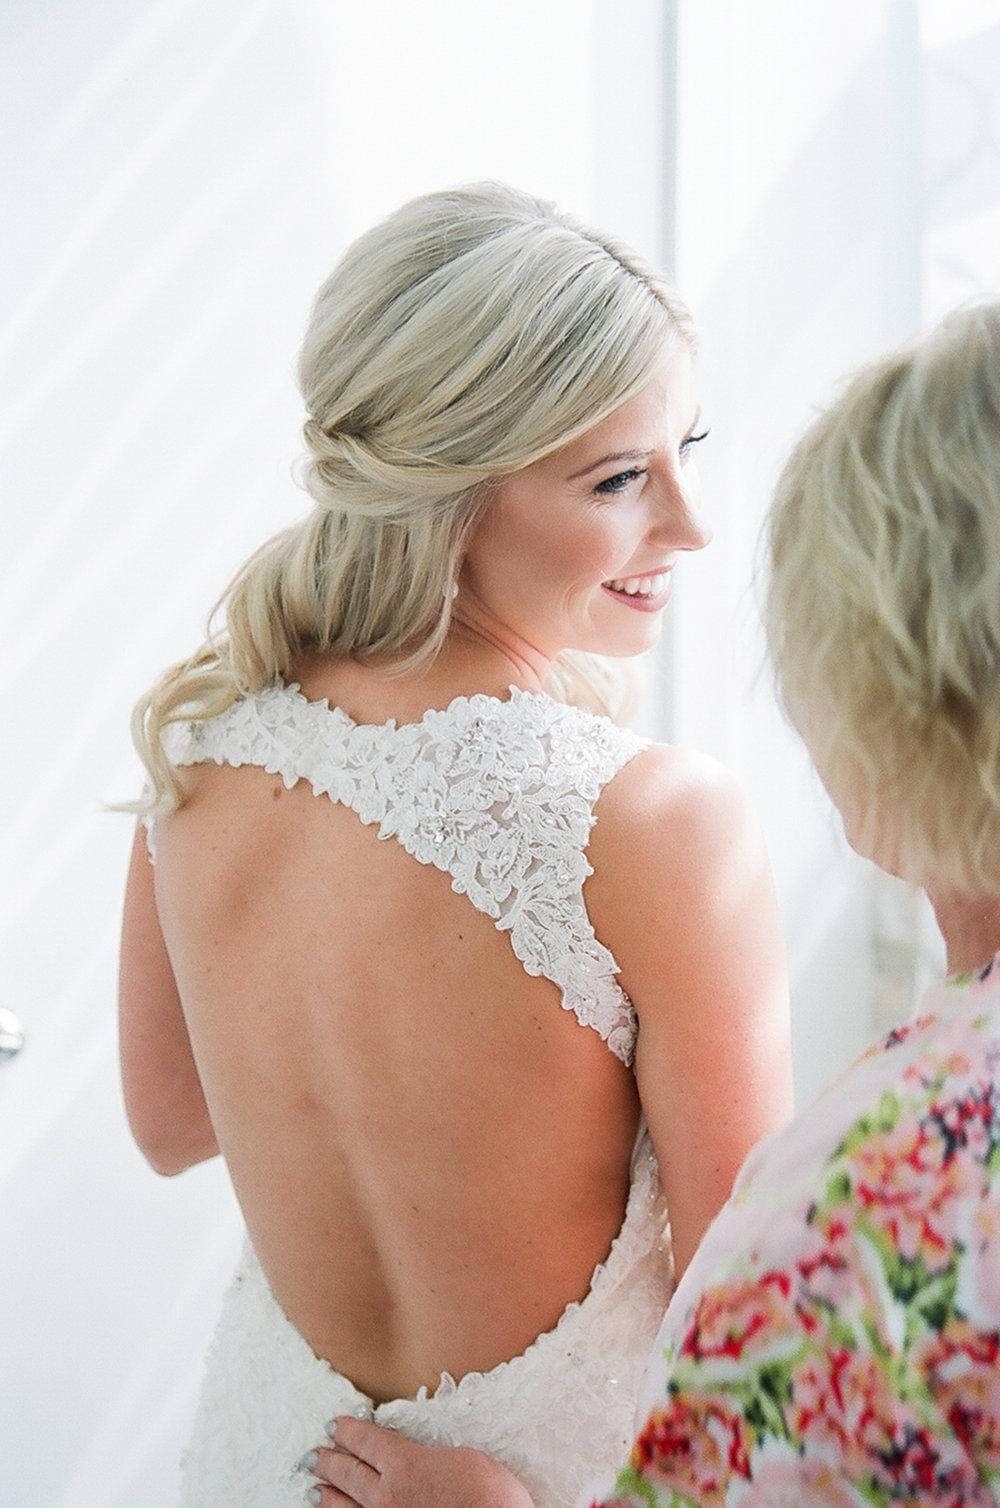 Bonphotage Chicago Fine Art Wedding Photography - Film Photographer